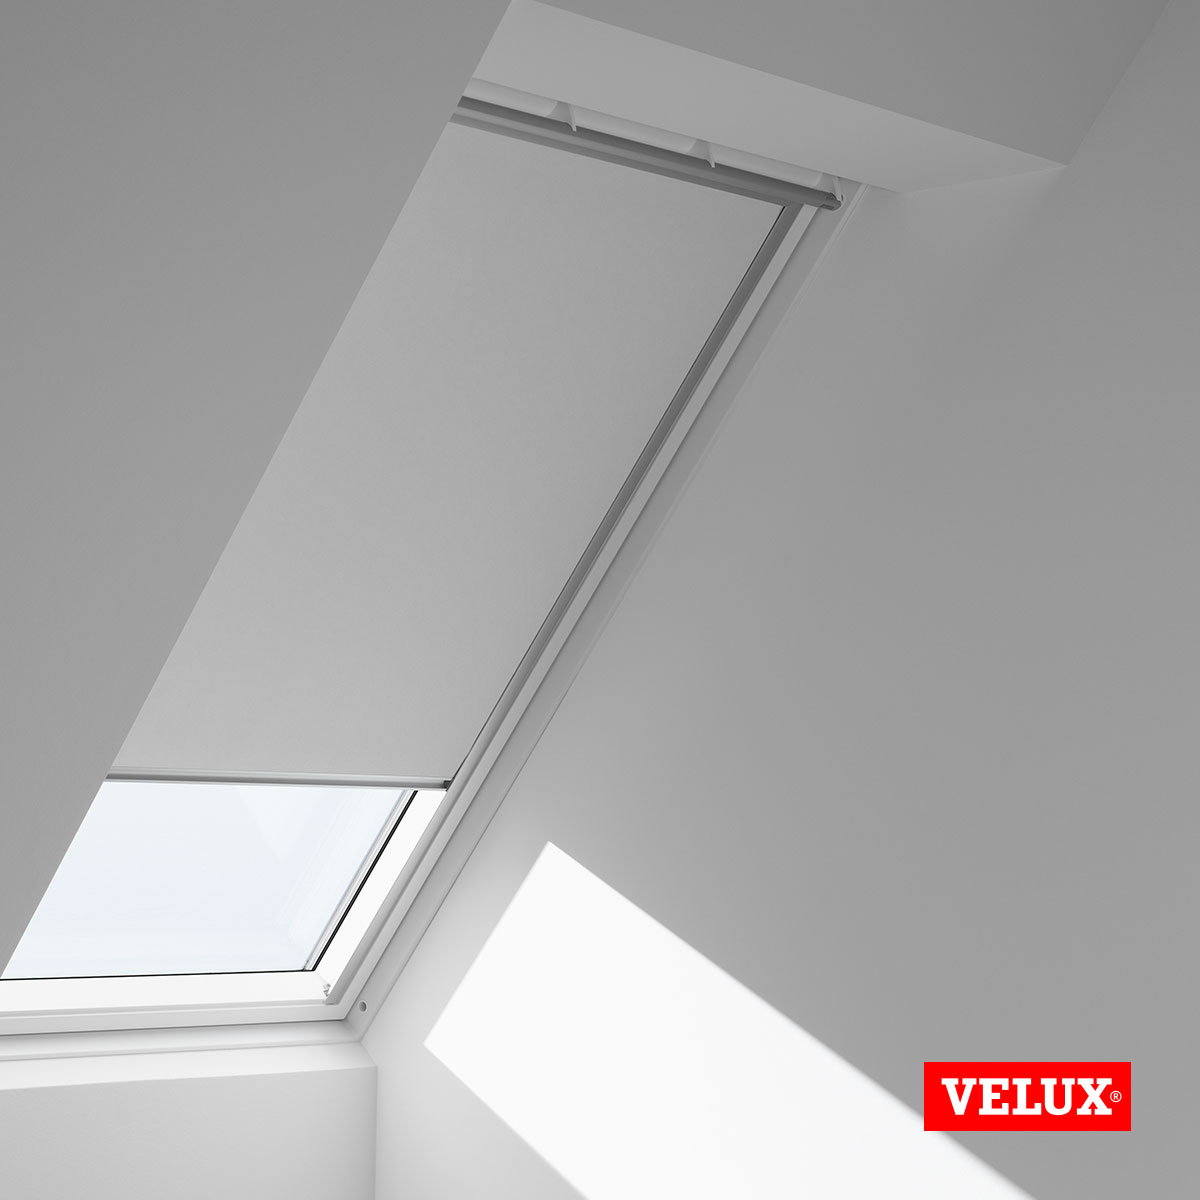 original velux verdunkelungsrollo f r velux dachfenster in. Black Bedroom Furniture Sets. Home Design Ideas